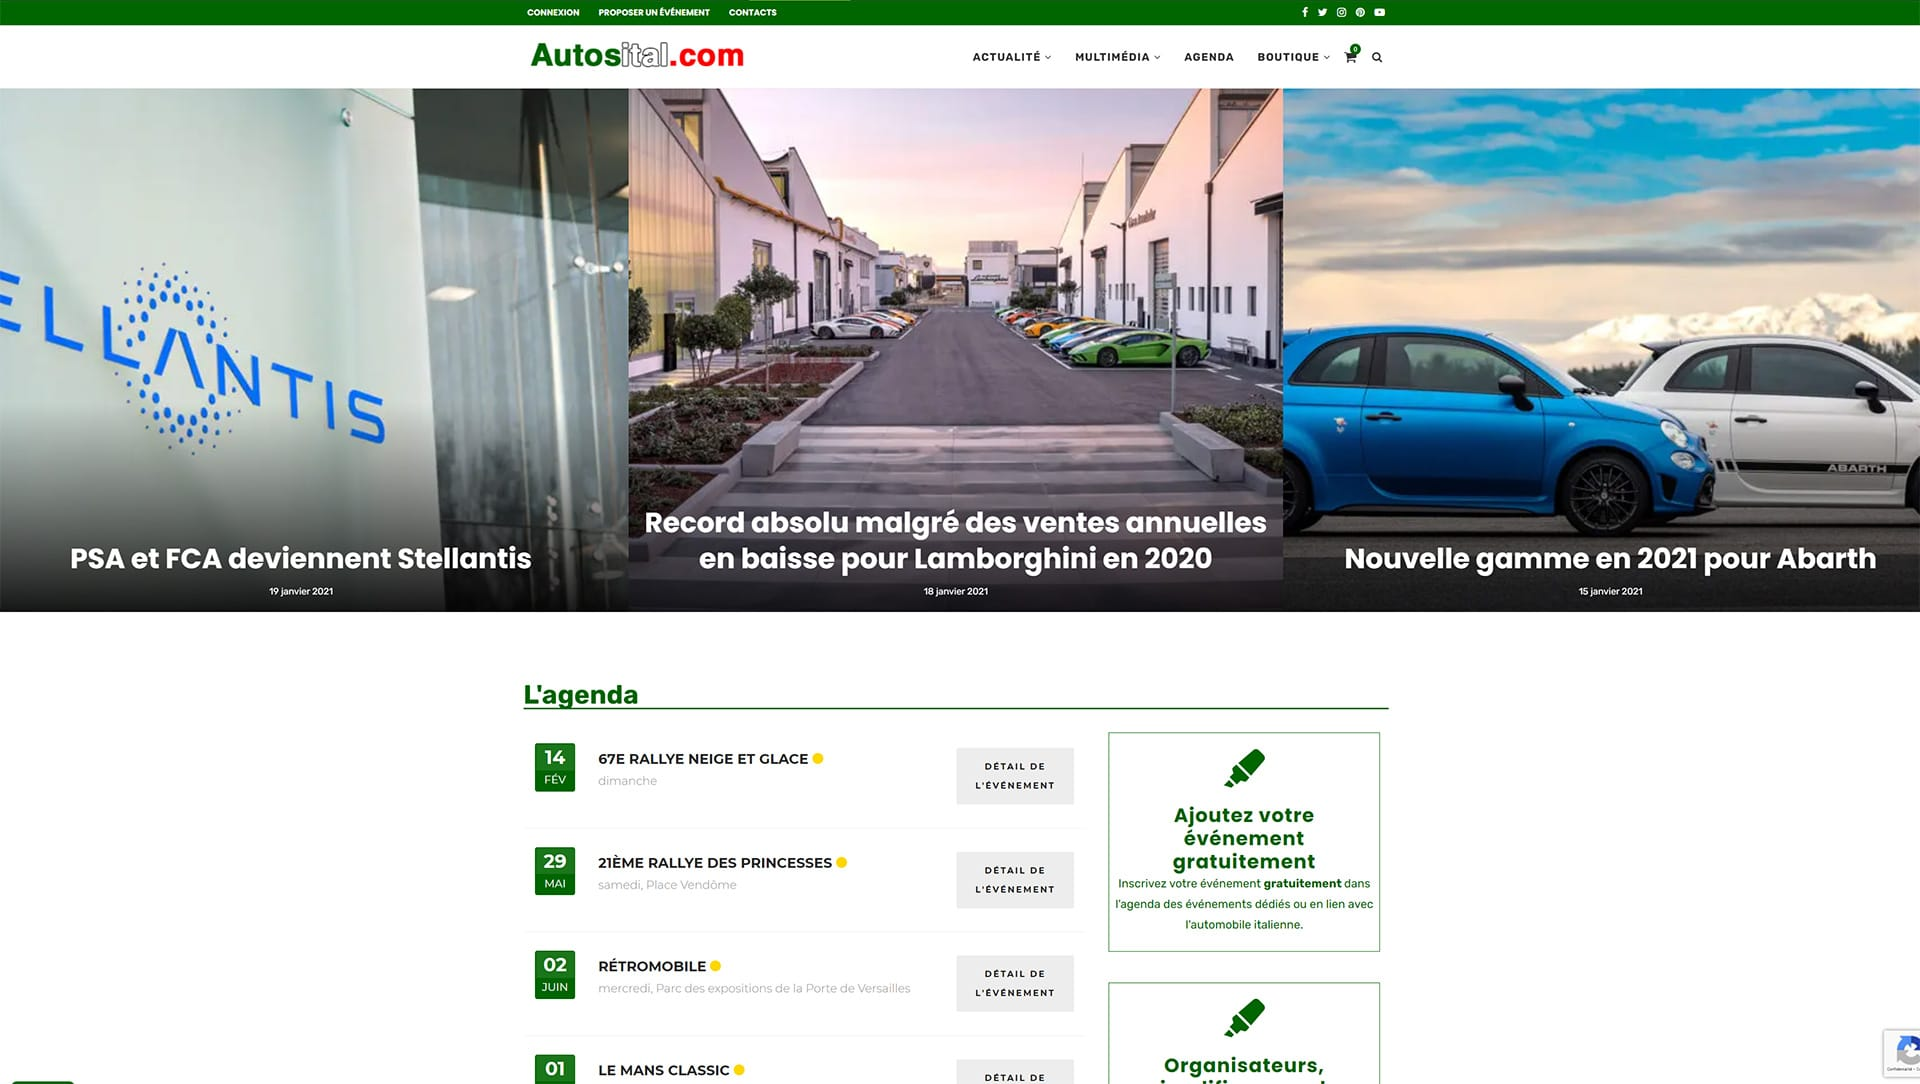 Une Autosital.com 2020